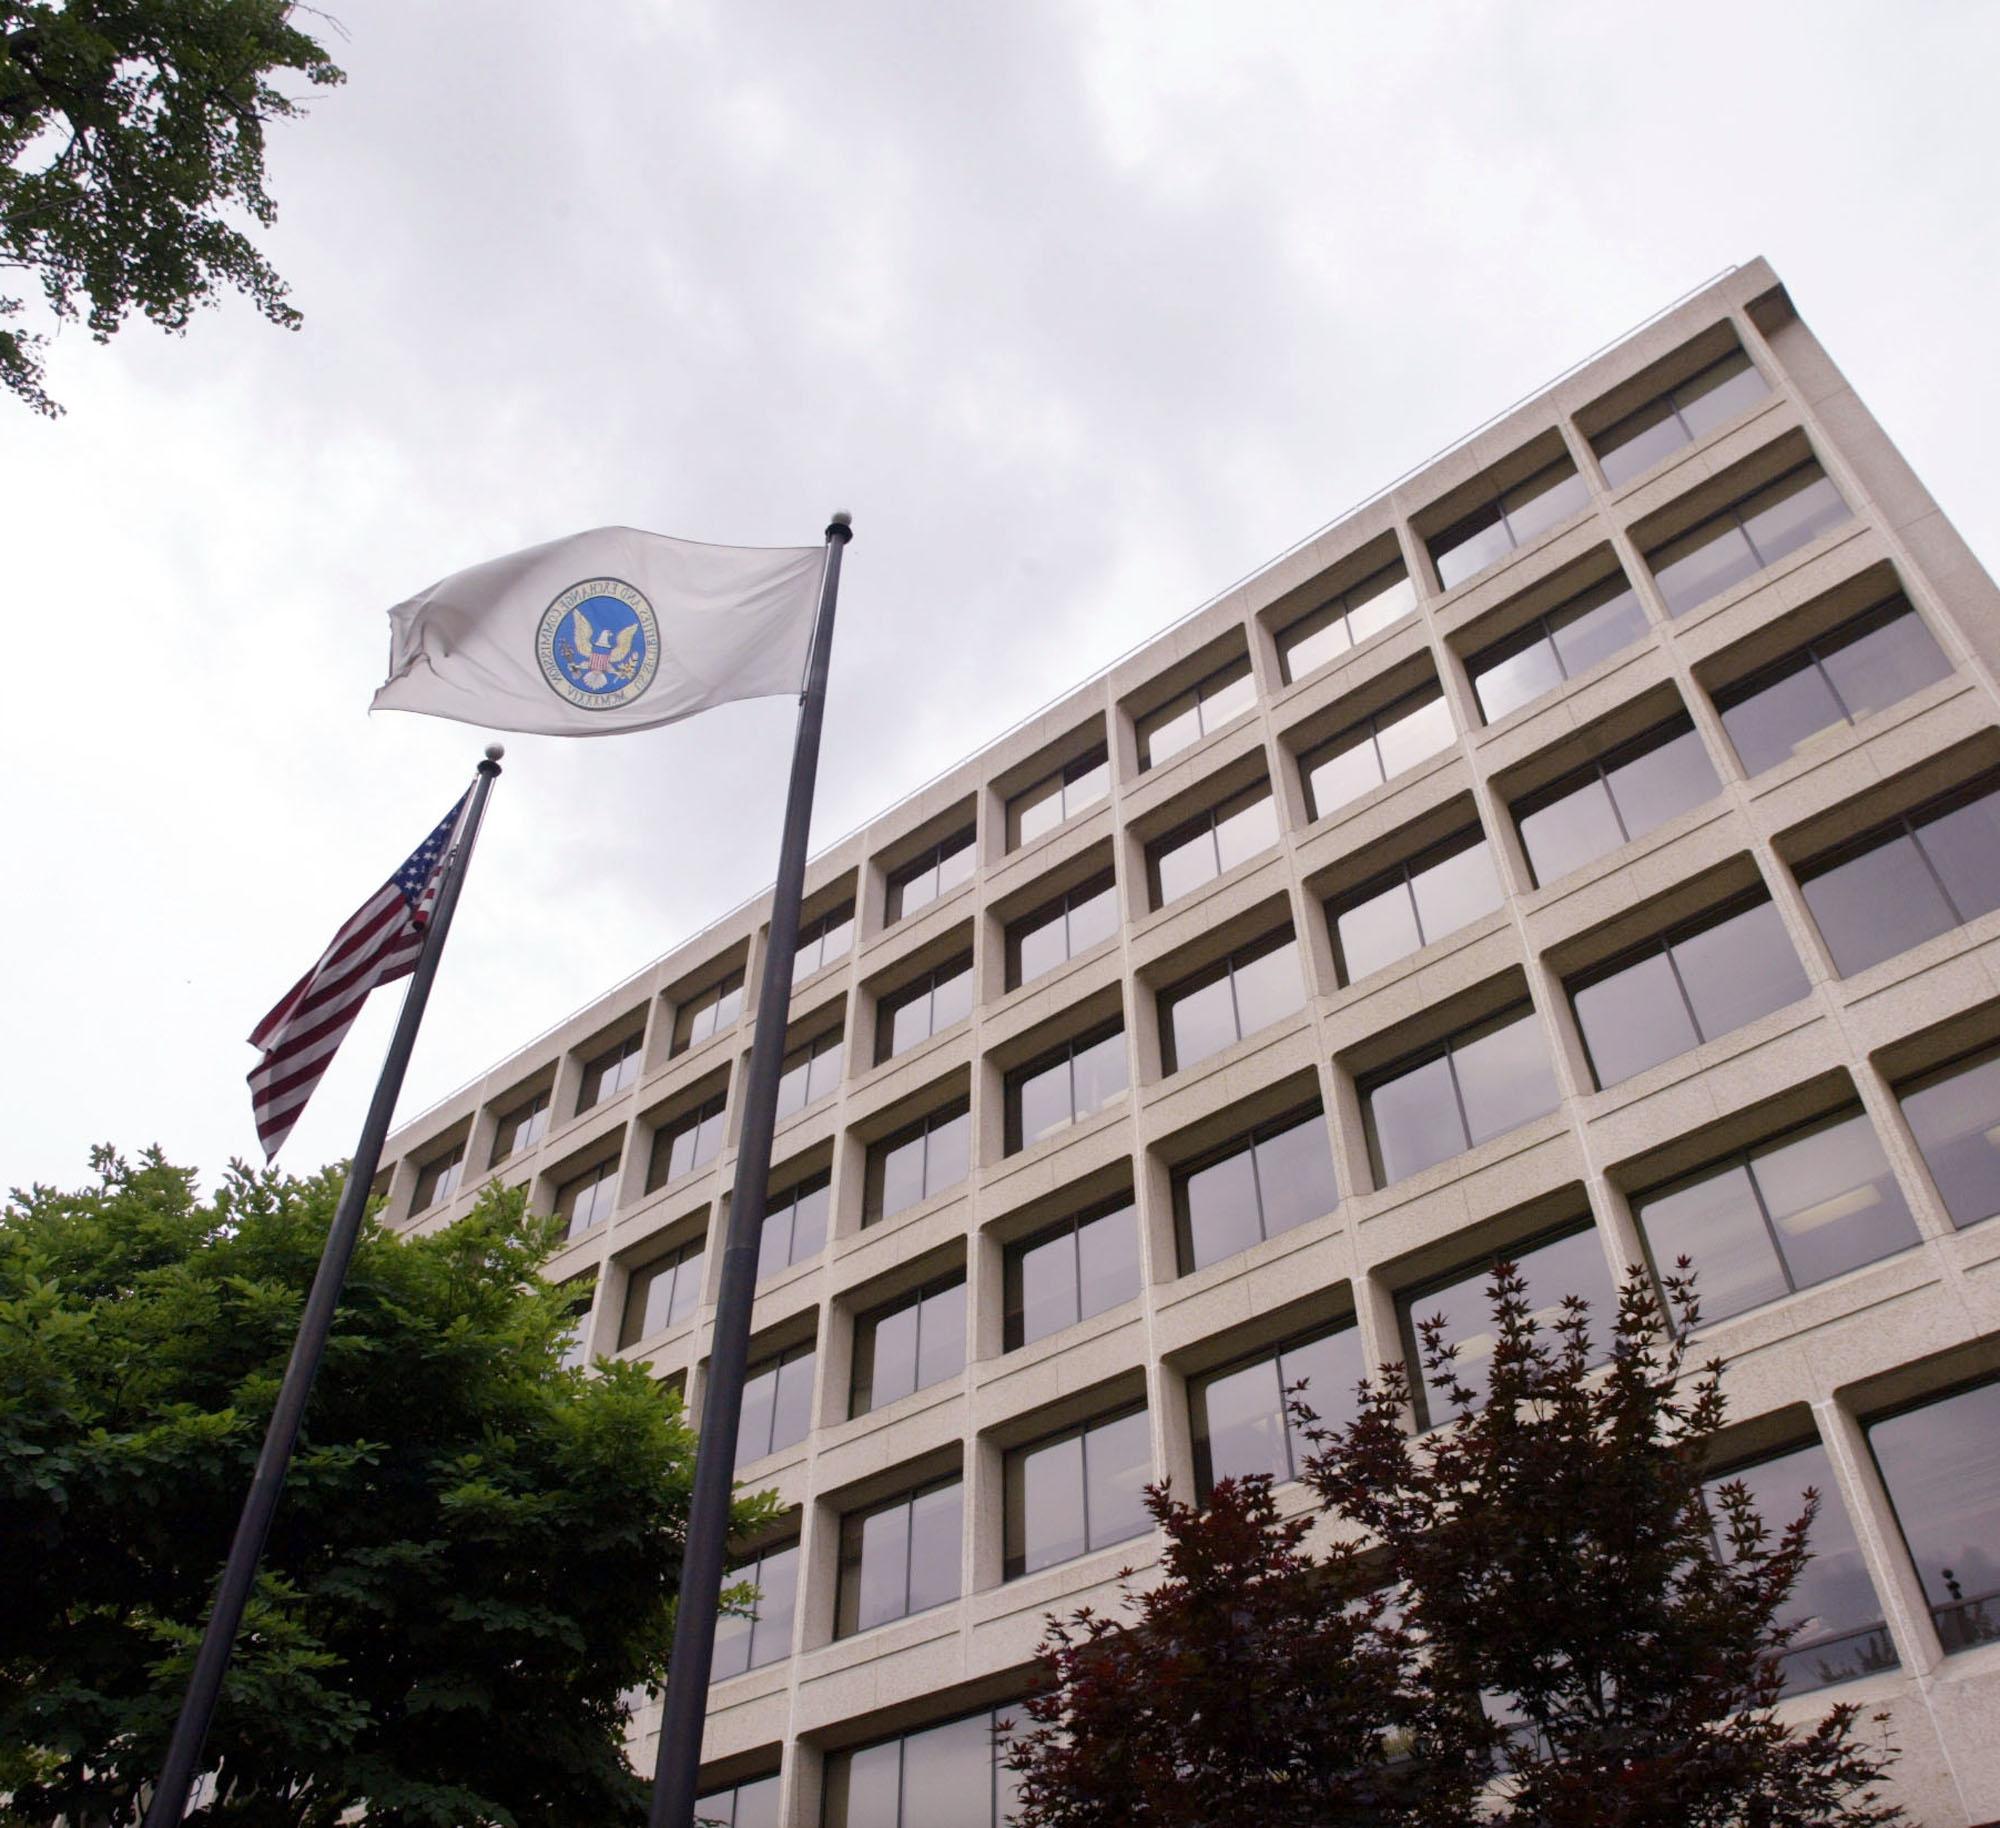 https://assets.sourcemedia.com/64/b9/f7404254408f91cd87e984078ddd/sec-office-headquarters-flag-building.JPG